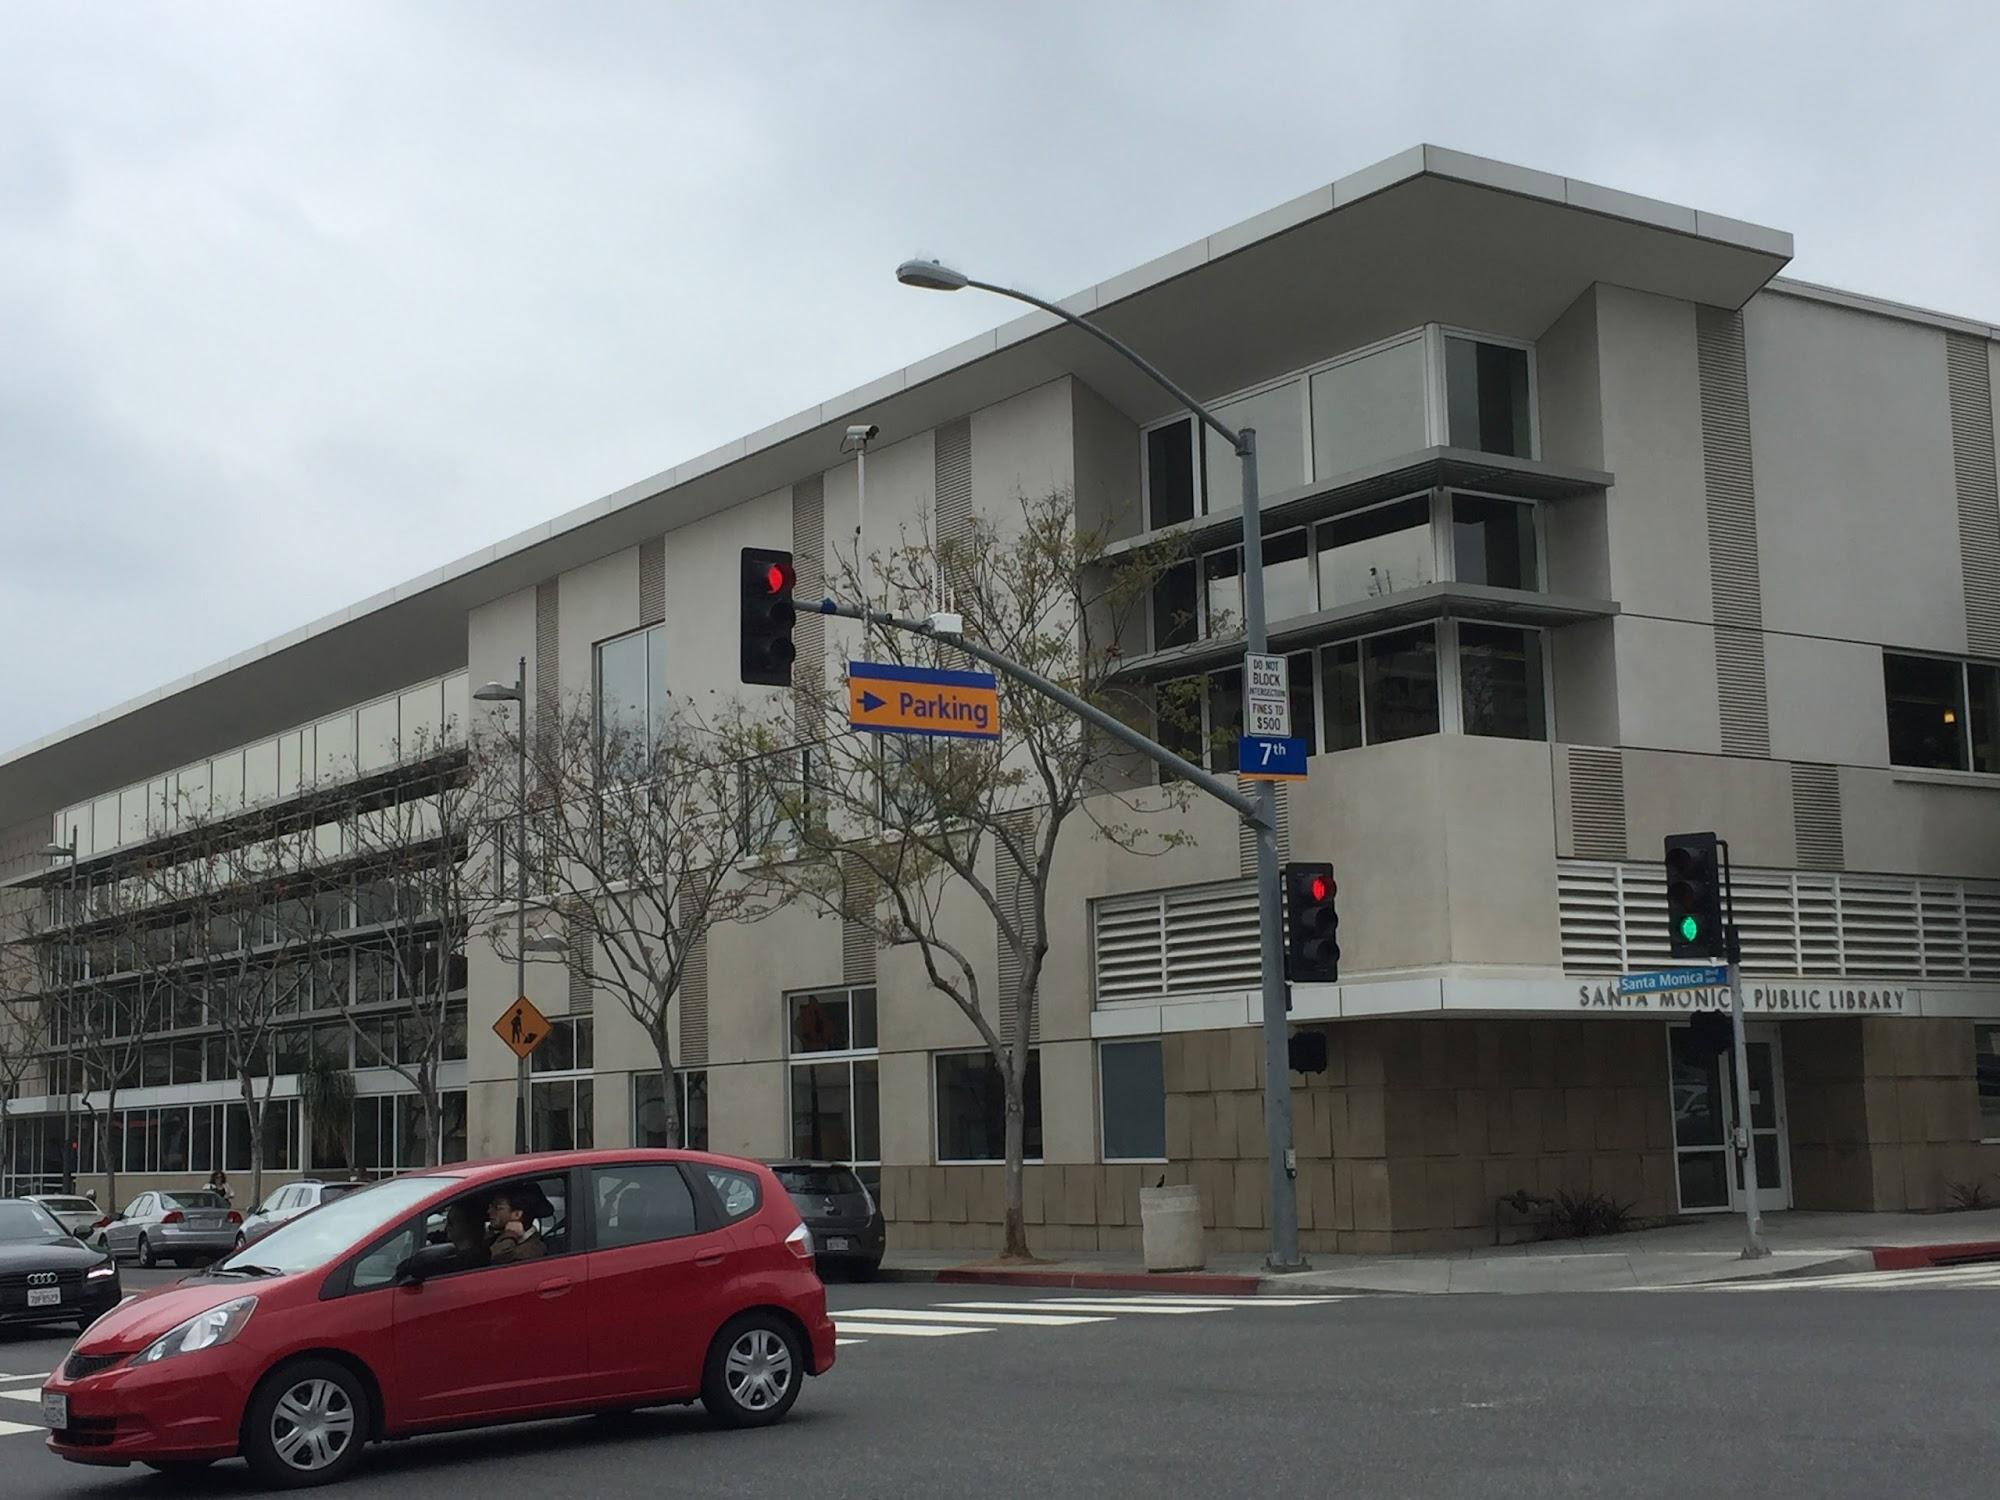 Santa Monica Public Library 601 Santa Monica Blvd, Santa Monica